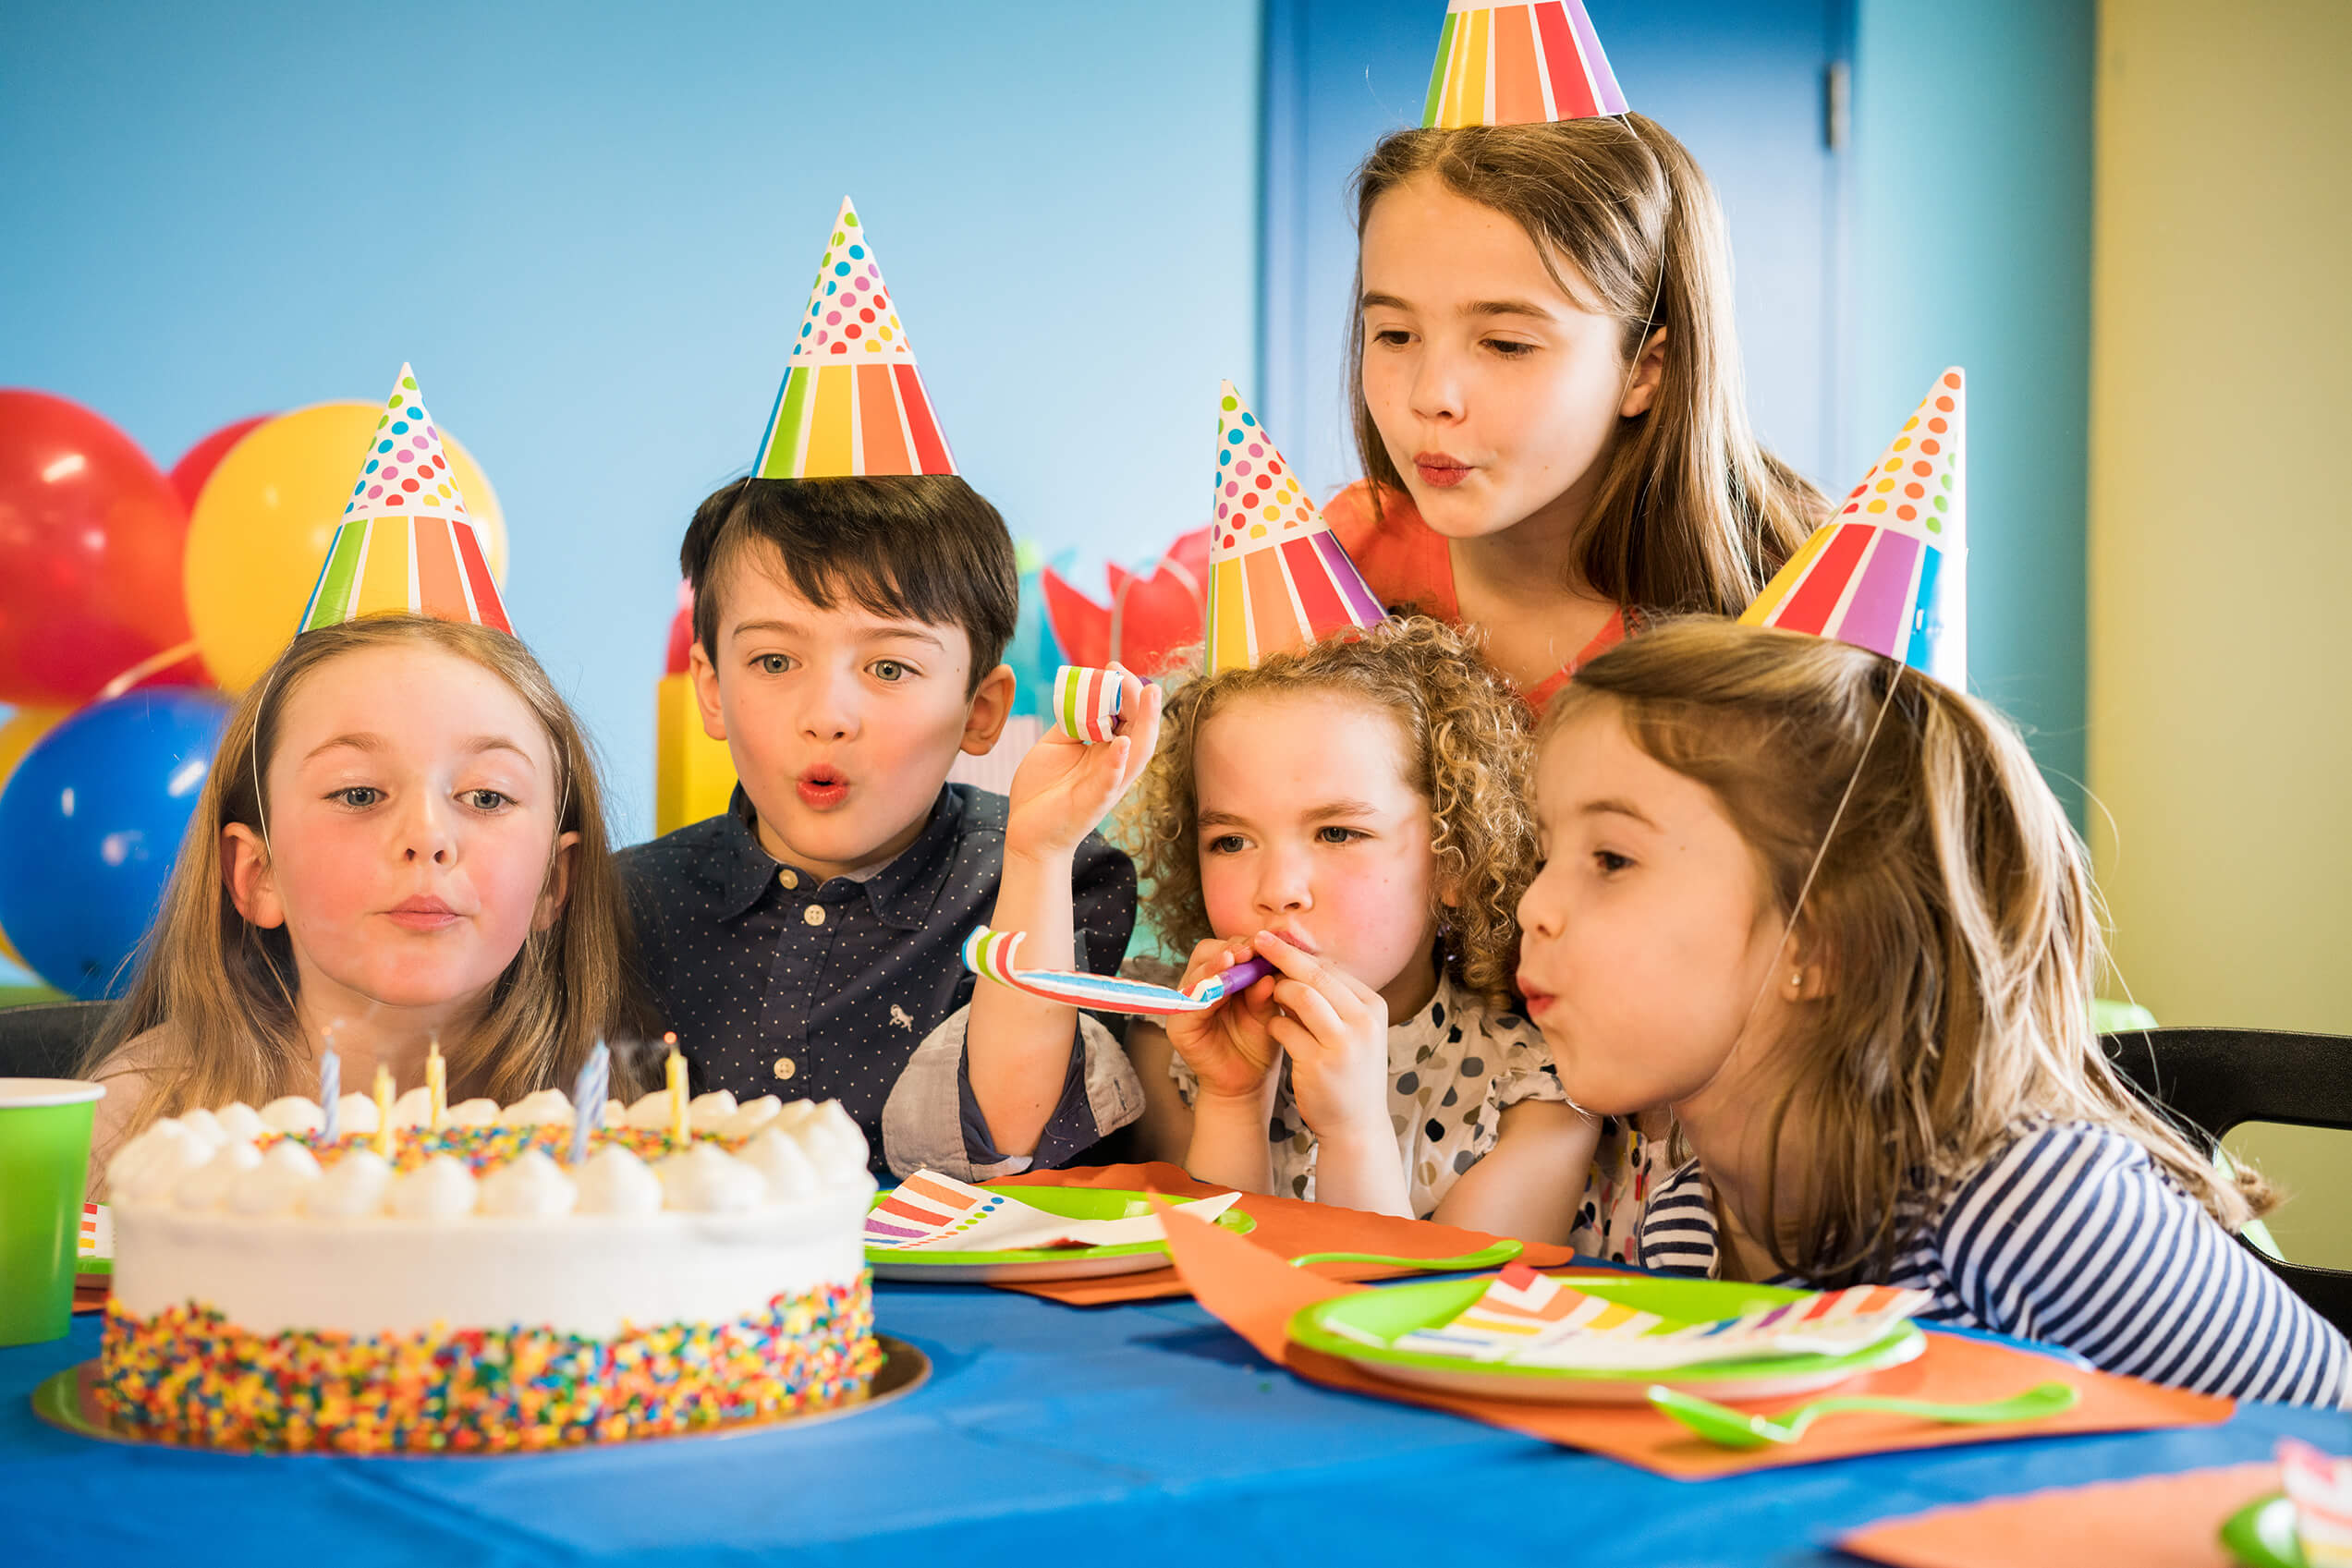 birthday parties recreofun family entertainment centers